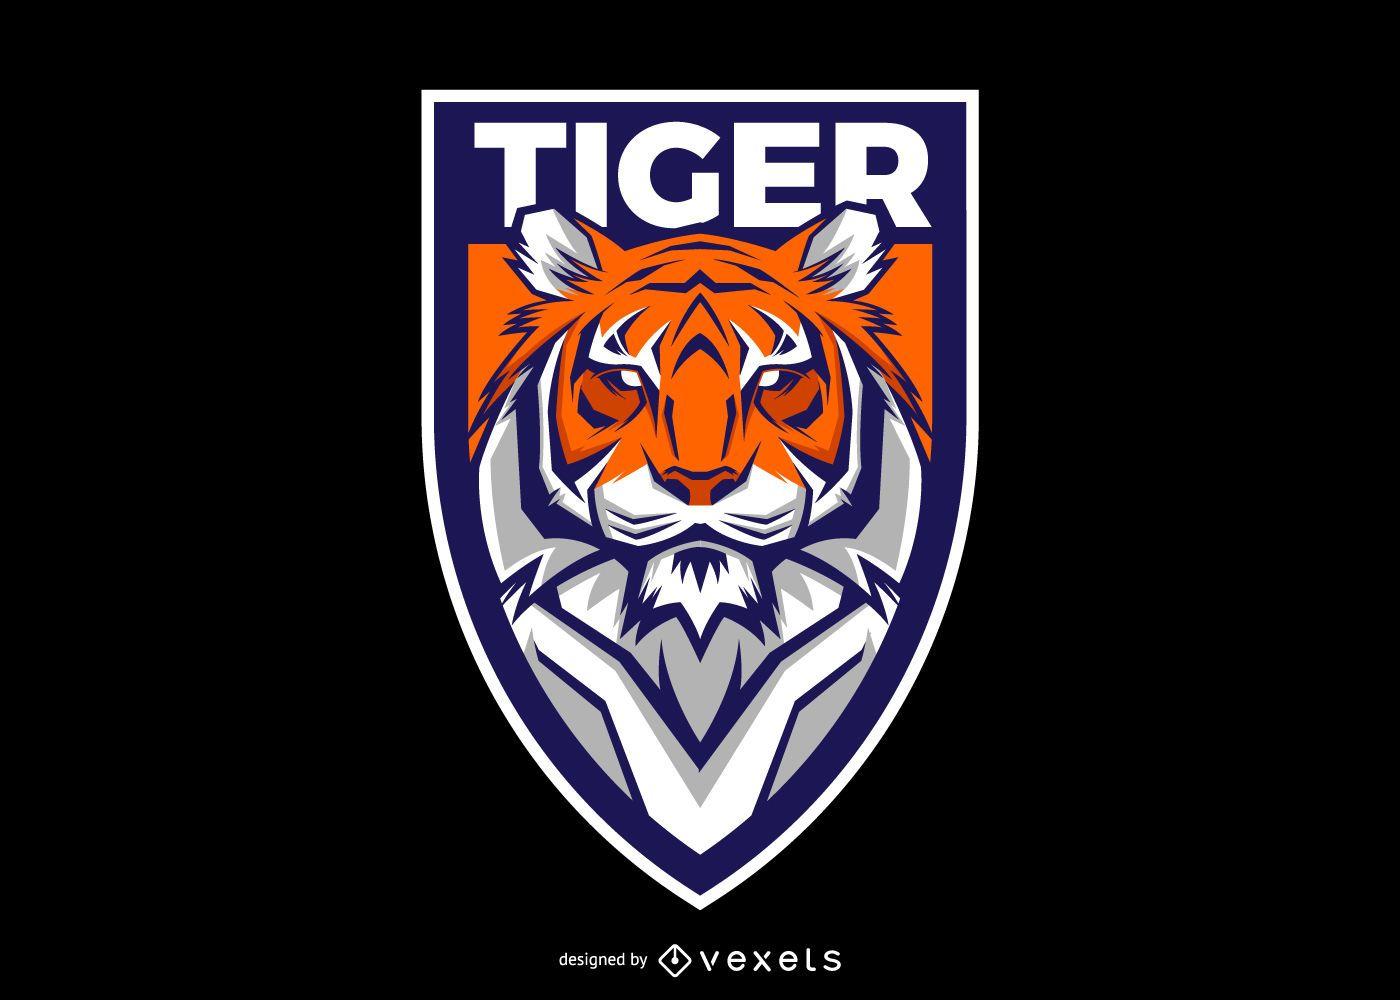 Tiger Shield Logo Design